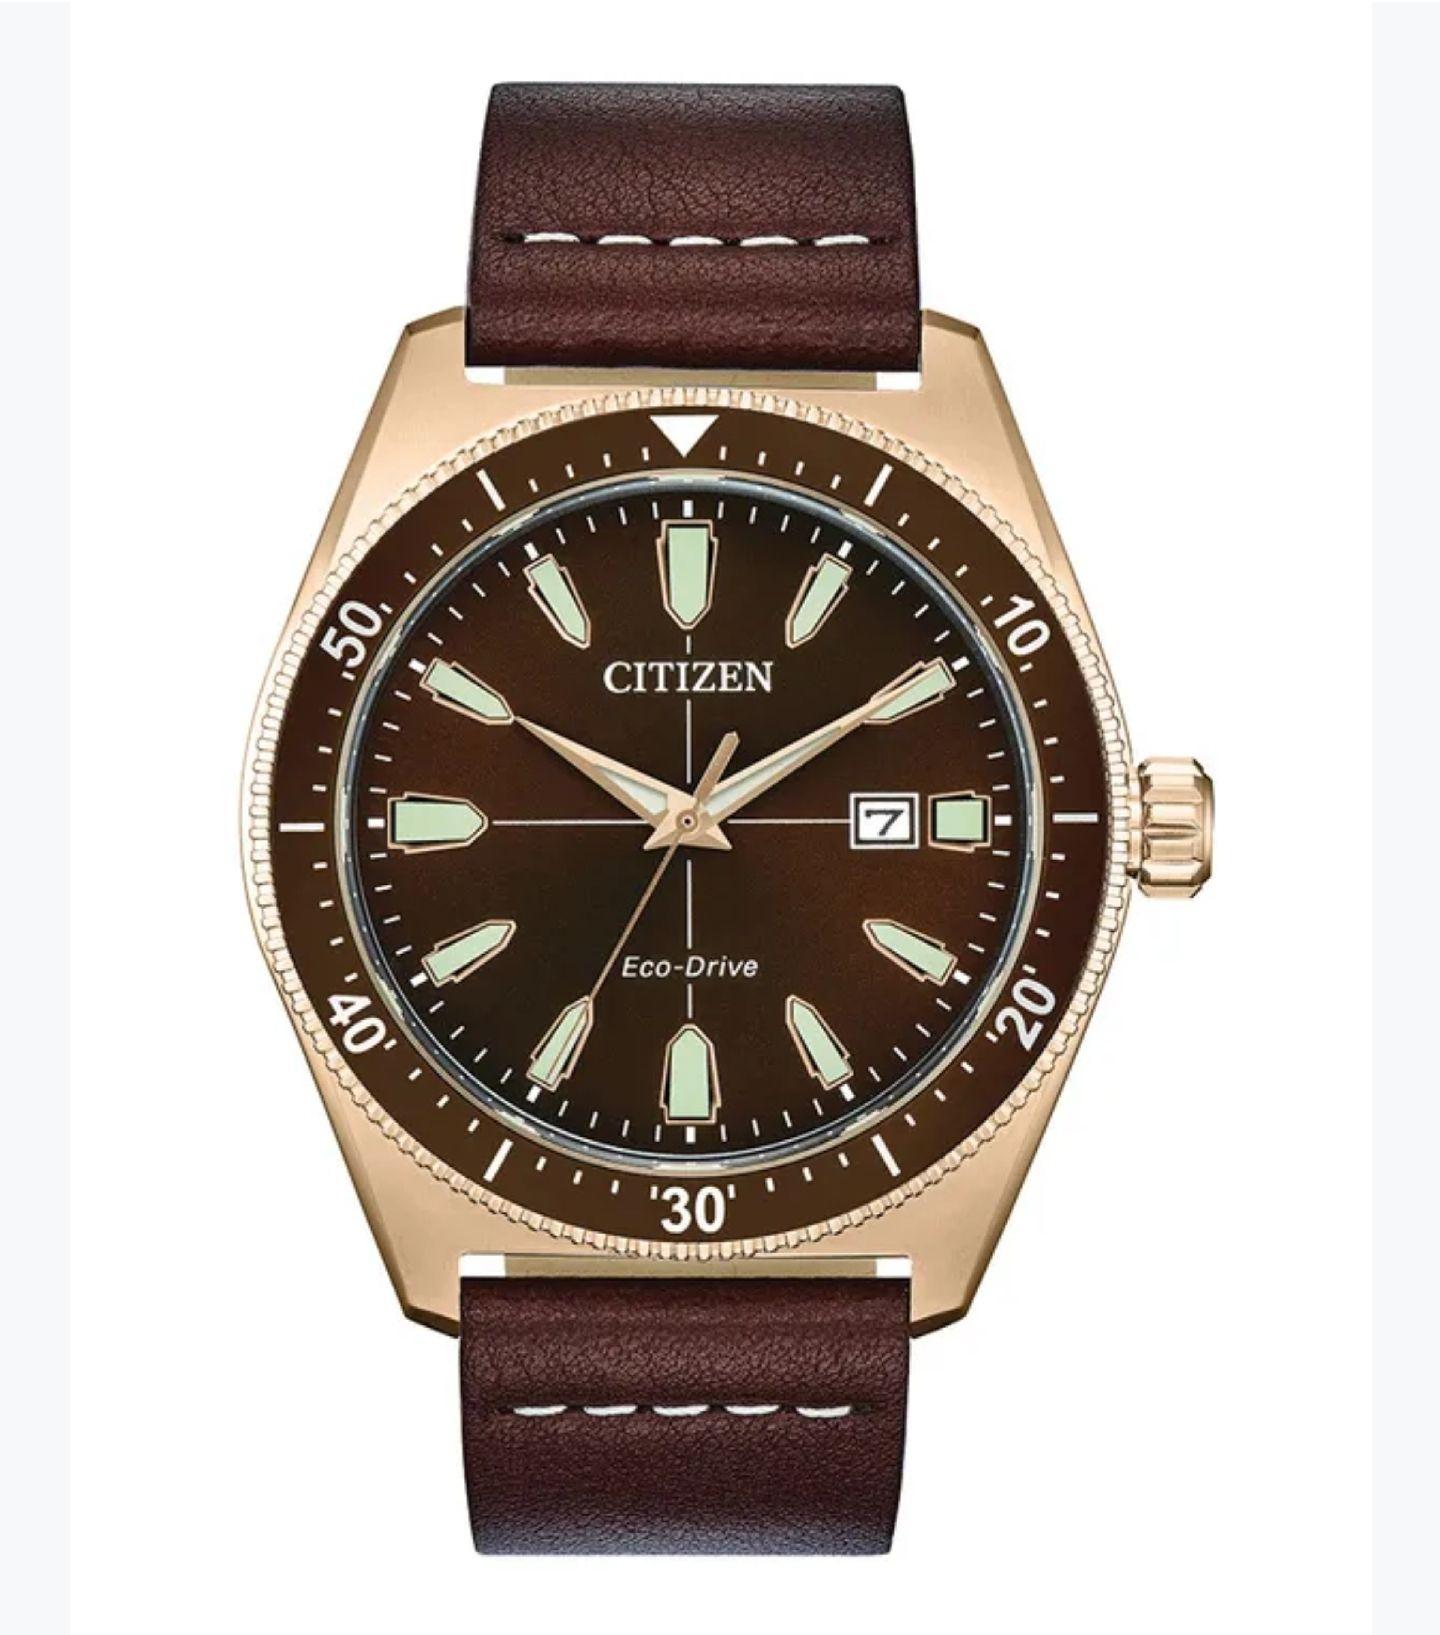 Citizen Men's Eco Drive Black Dial Brown Leather Strap Watch £109 @ H Samuel